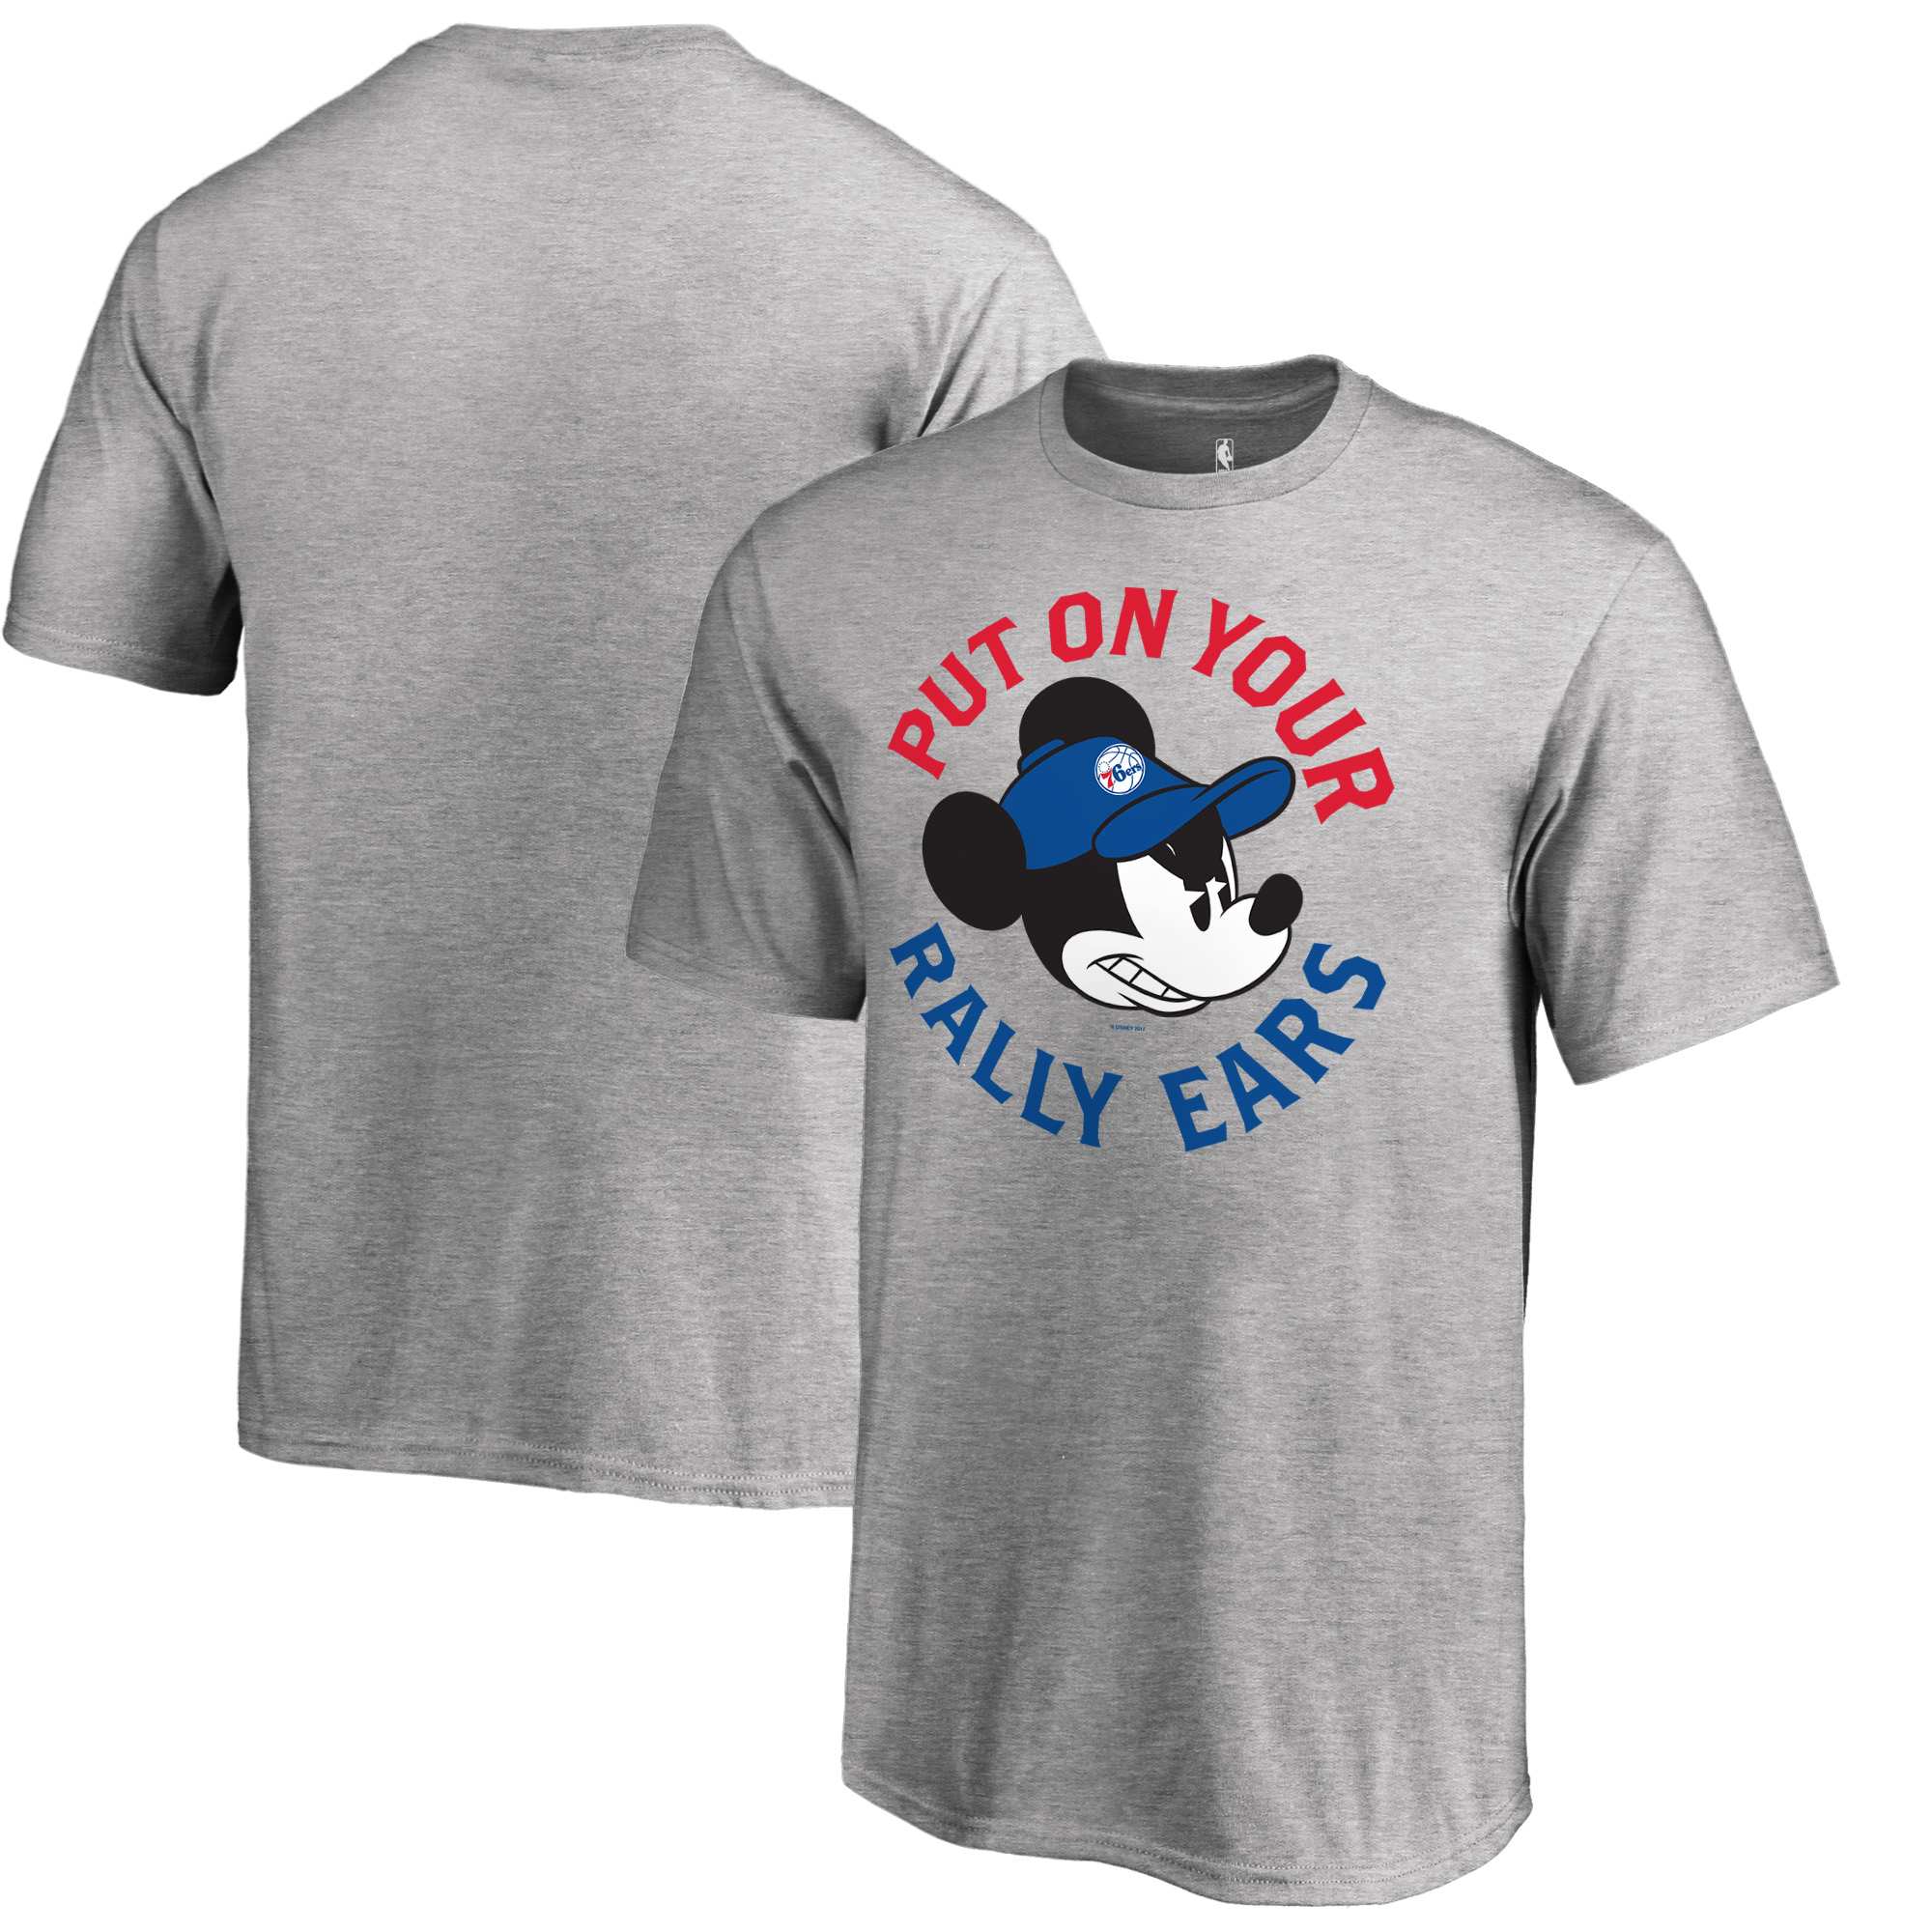 Philadelphia 76ers Fanatics Branded Youth Disney Rally Ears T-Shirt - Ash